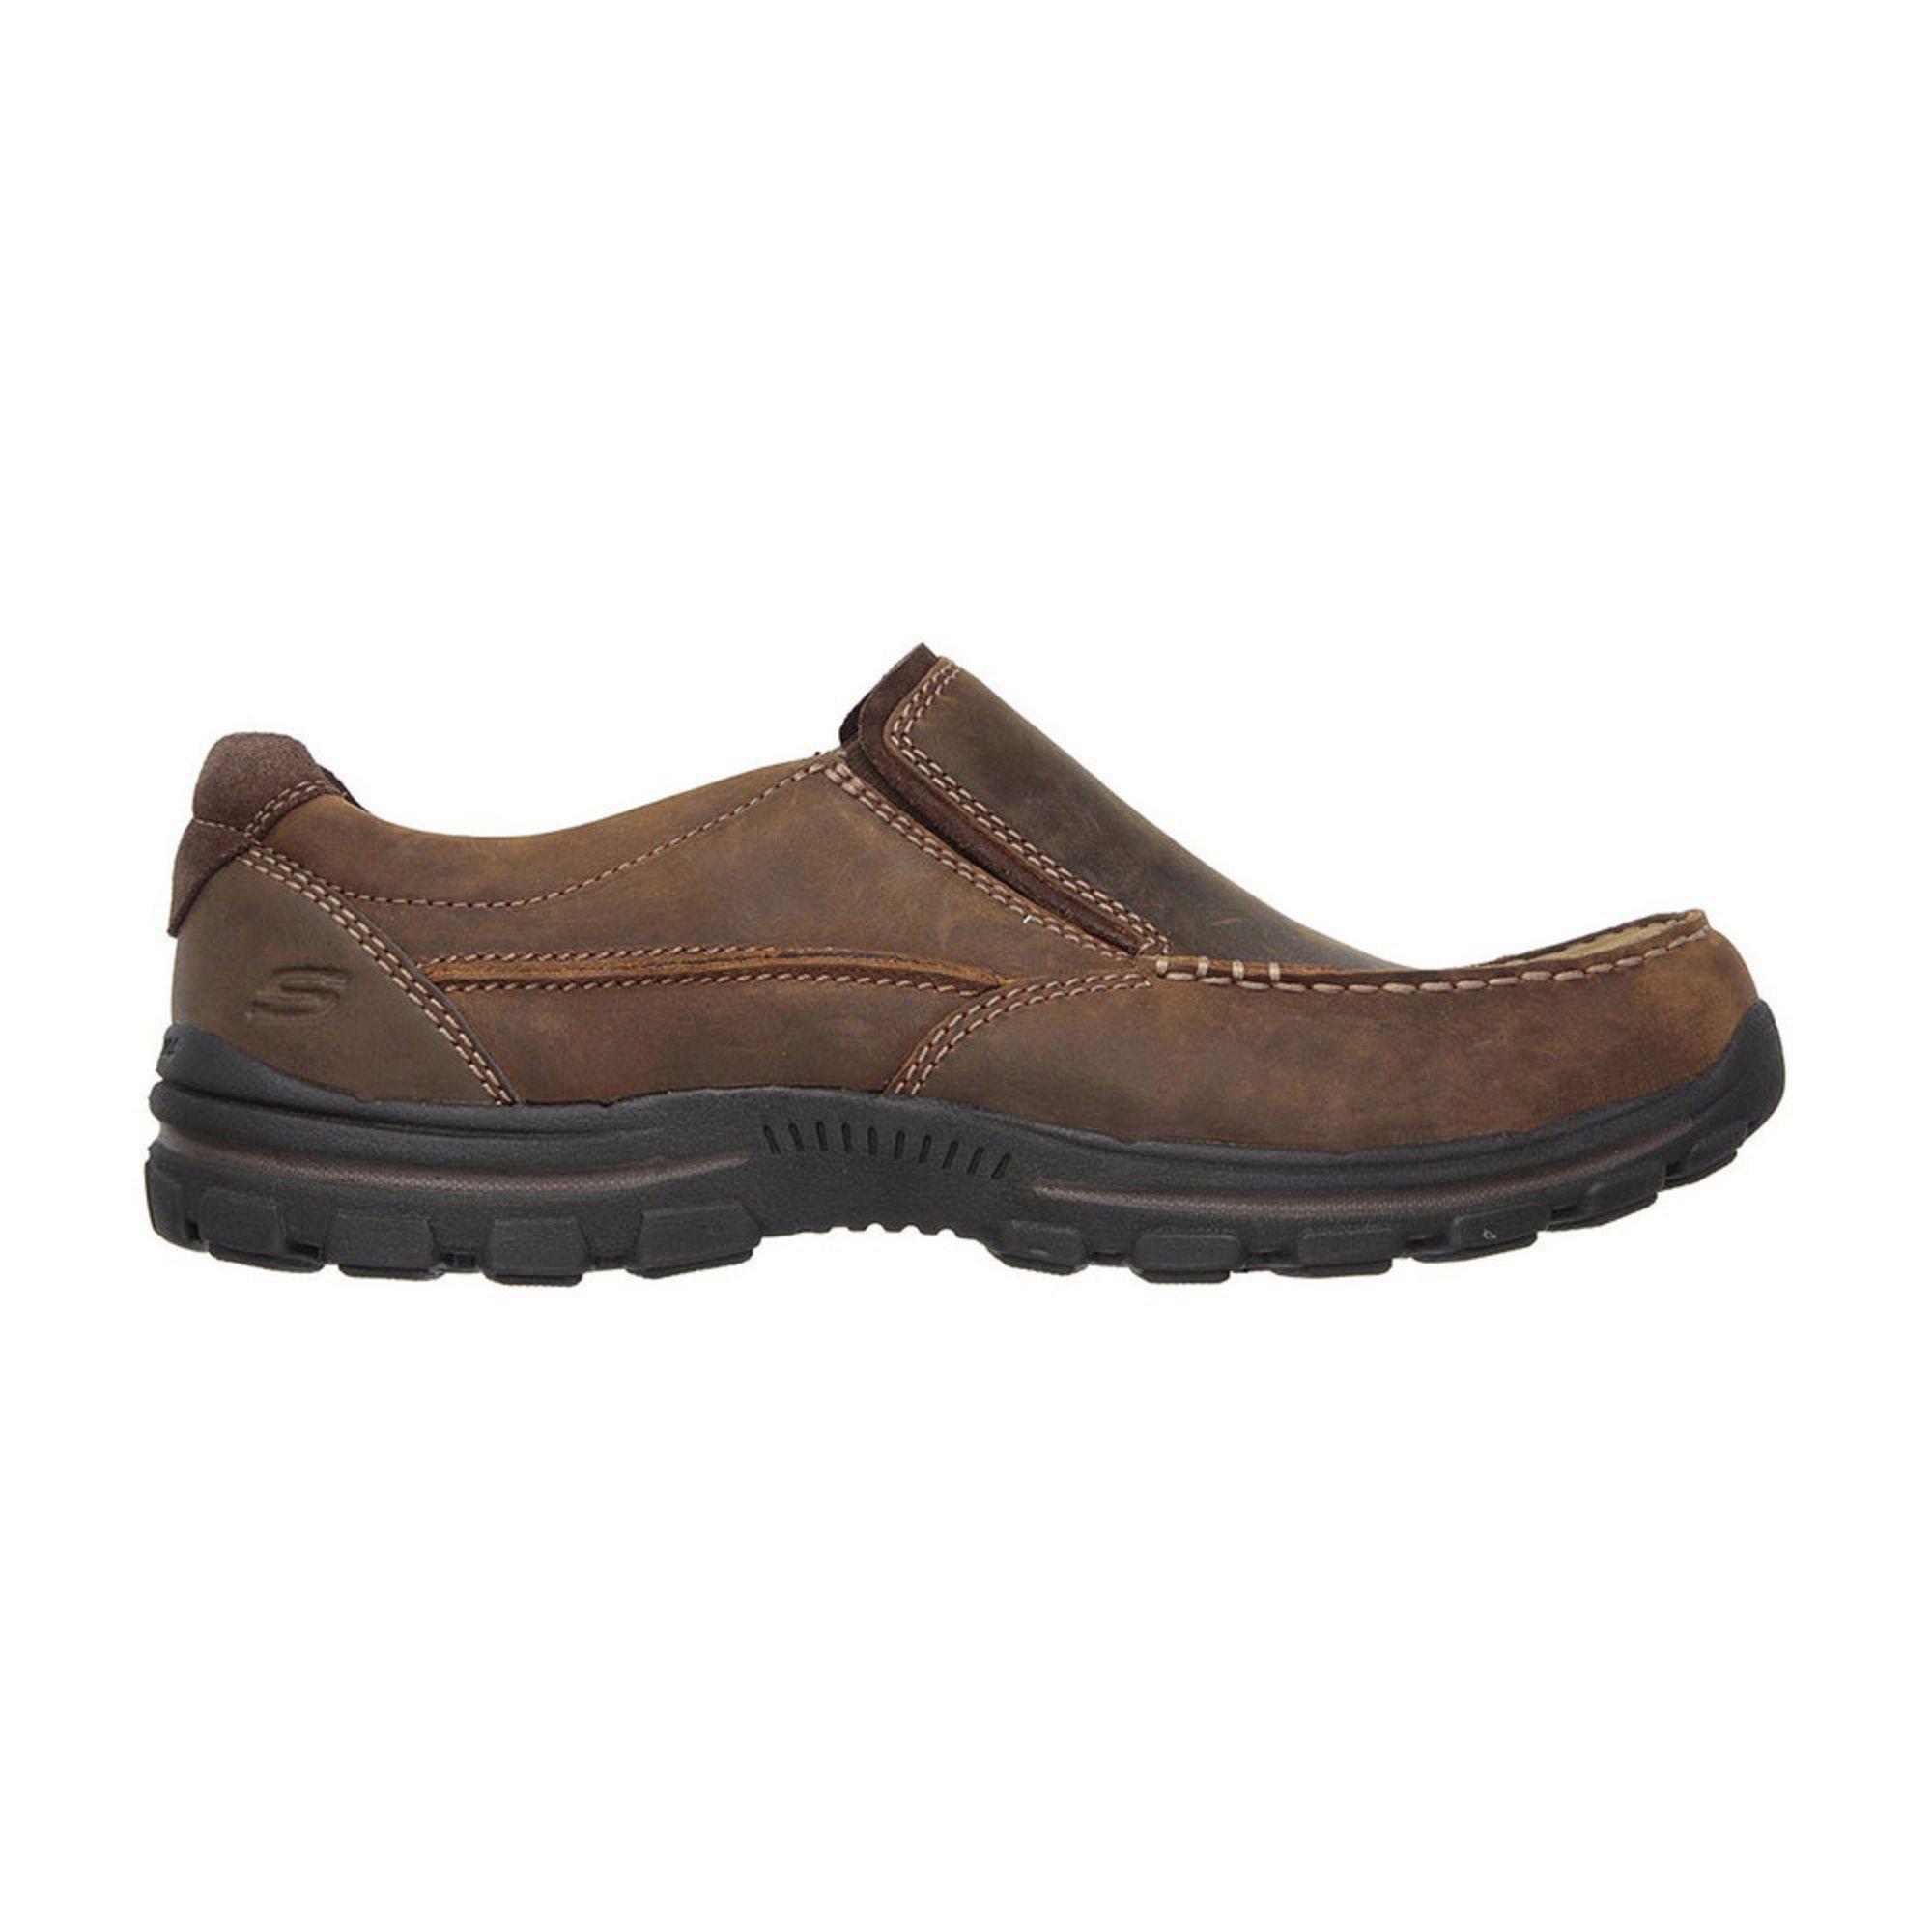 9752fec7bd051 Skechers Men's Braver Rayland Slip On | Men's Casual Shoes | Shoes ...